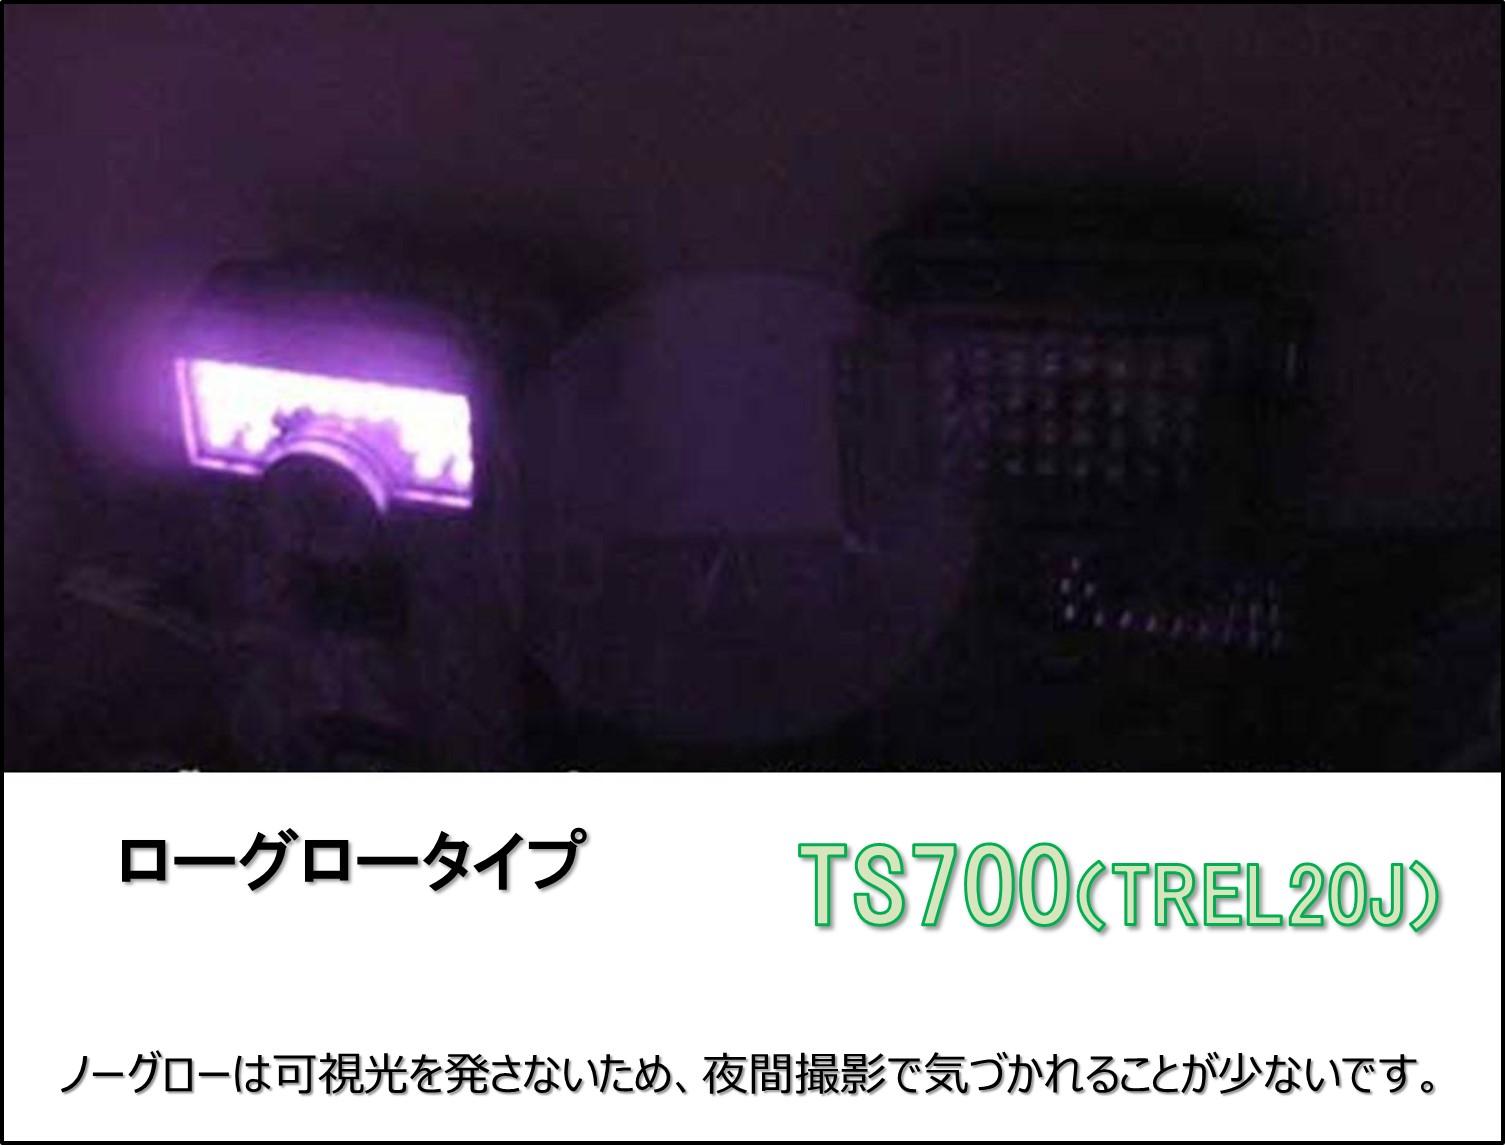 TS700 ノーグロー